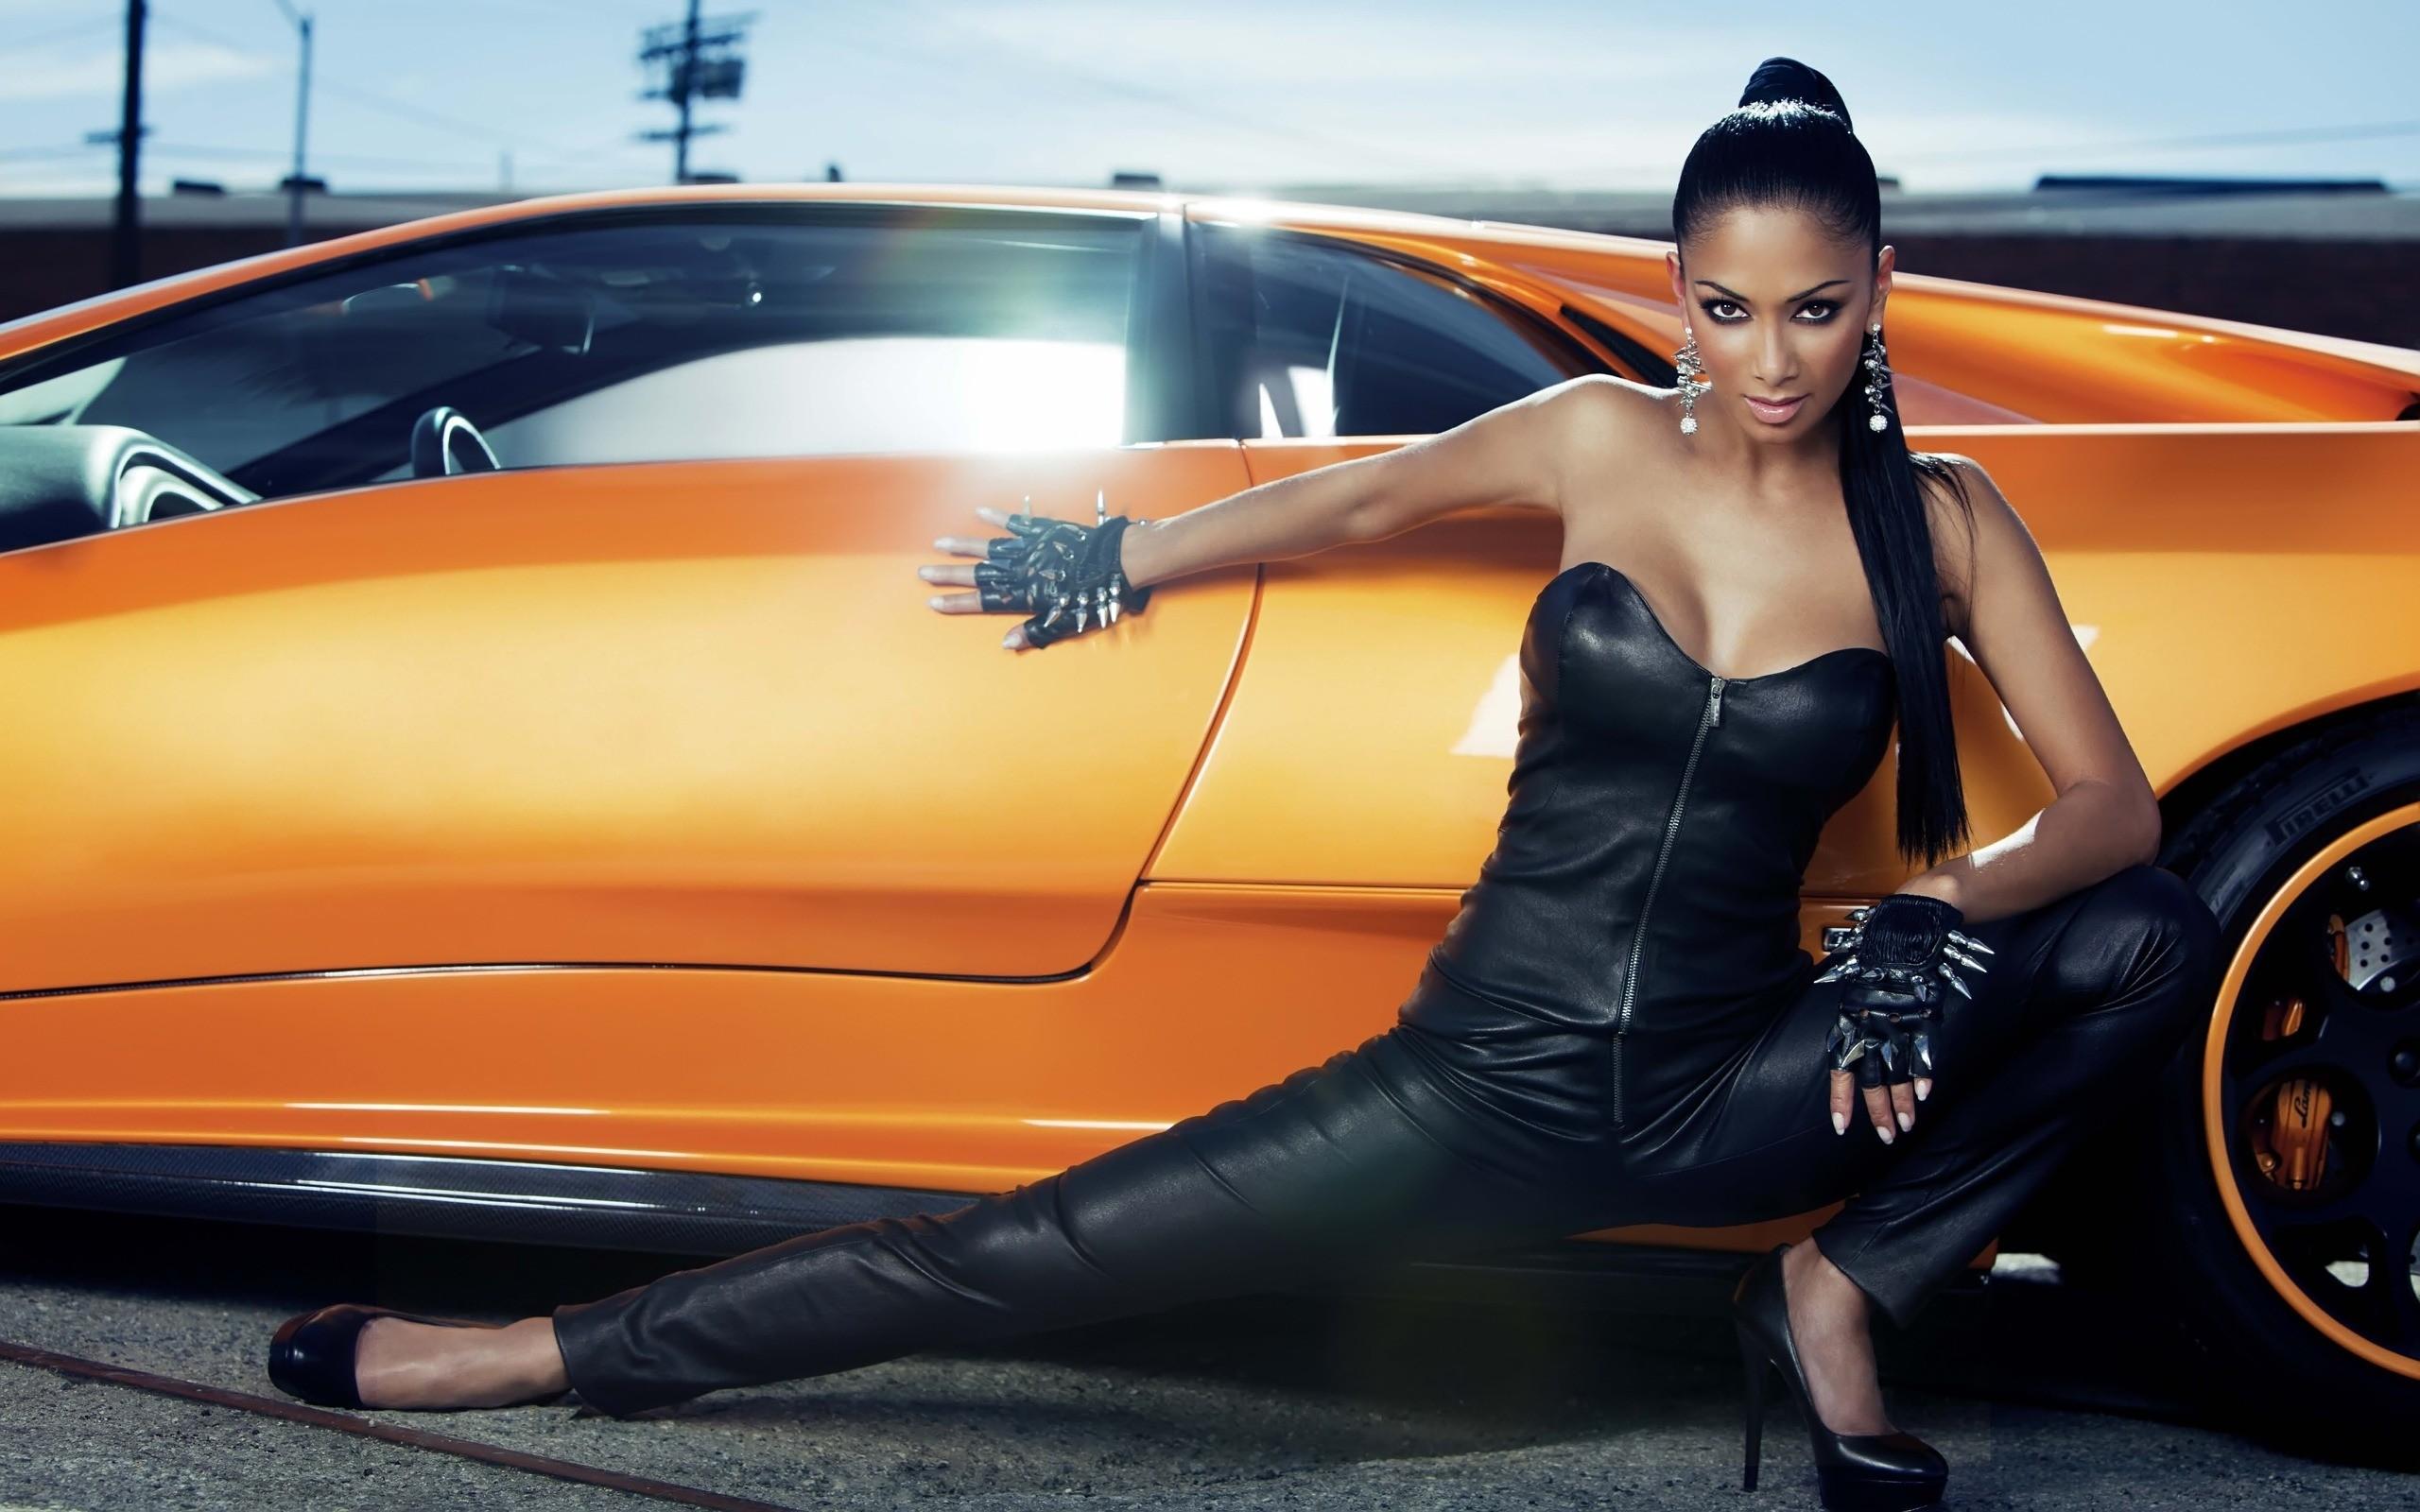 Salman Khan Car Photo Wallpaper Facebook Covers For Nicole Scherzinger Popopics Com